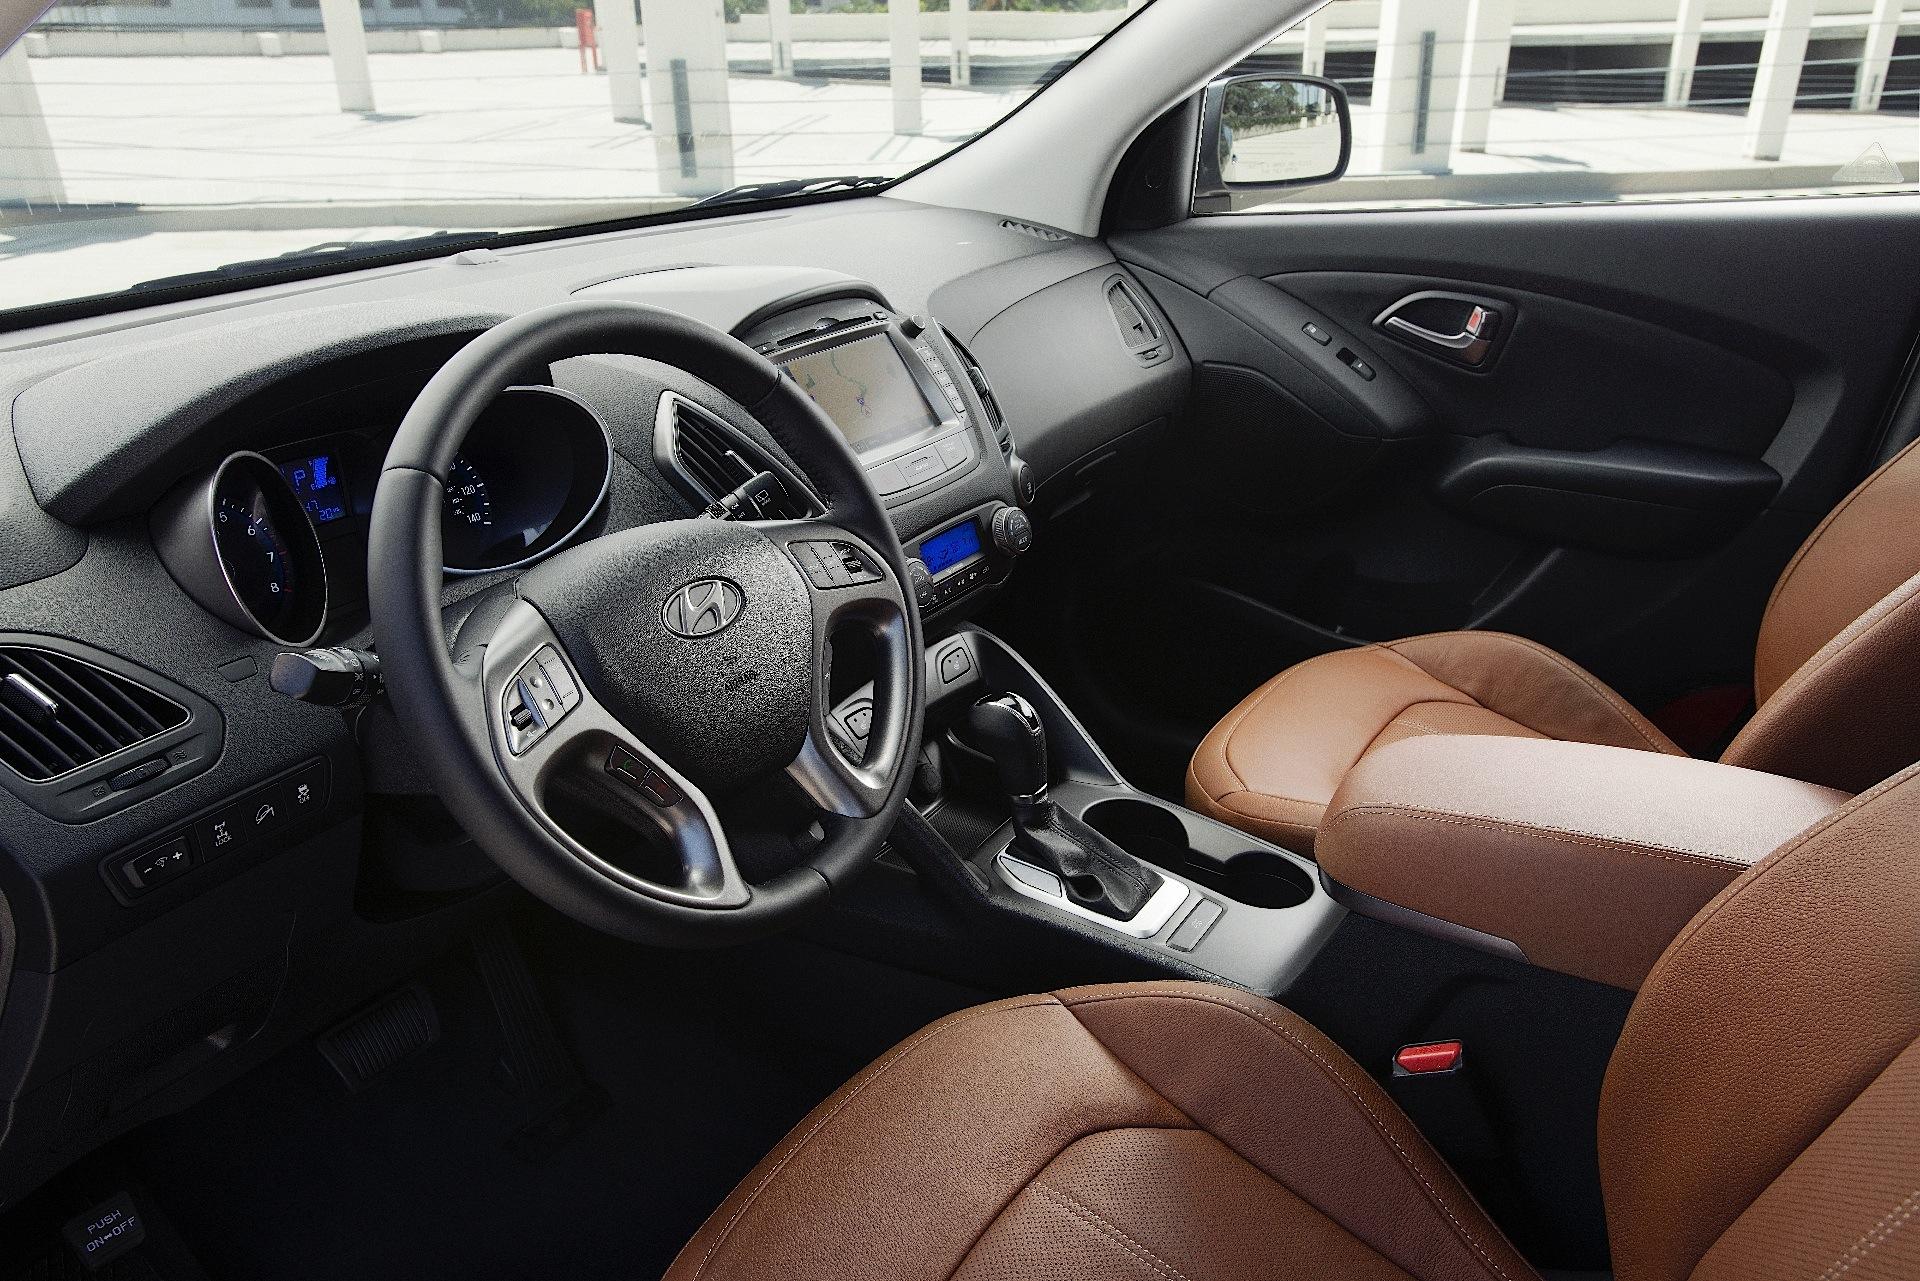 Hyundai Ix Tucson on 2013 Ford 5 0 Engine Specs